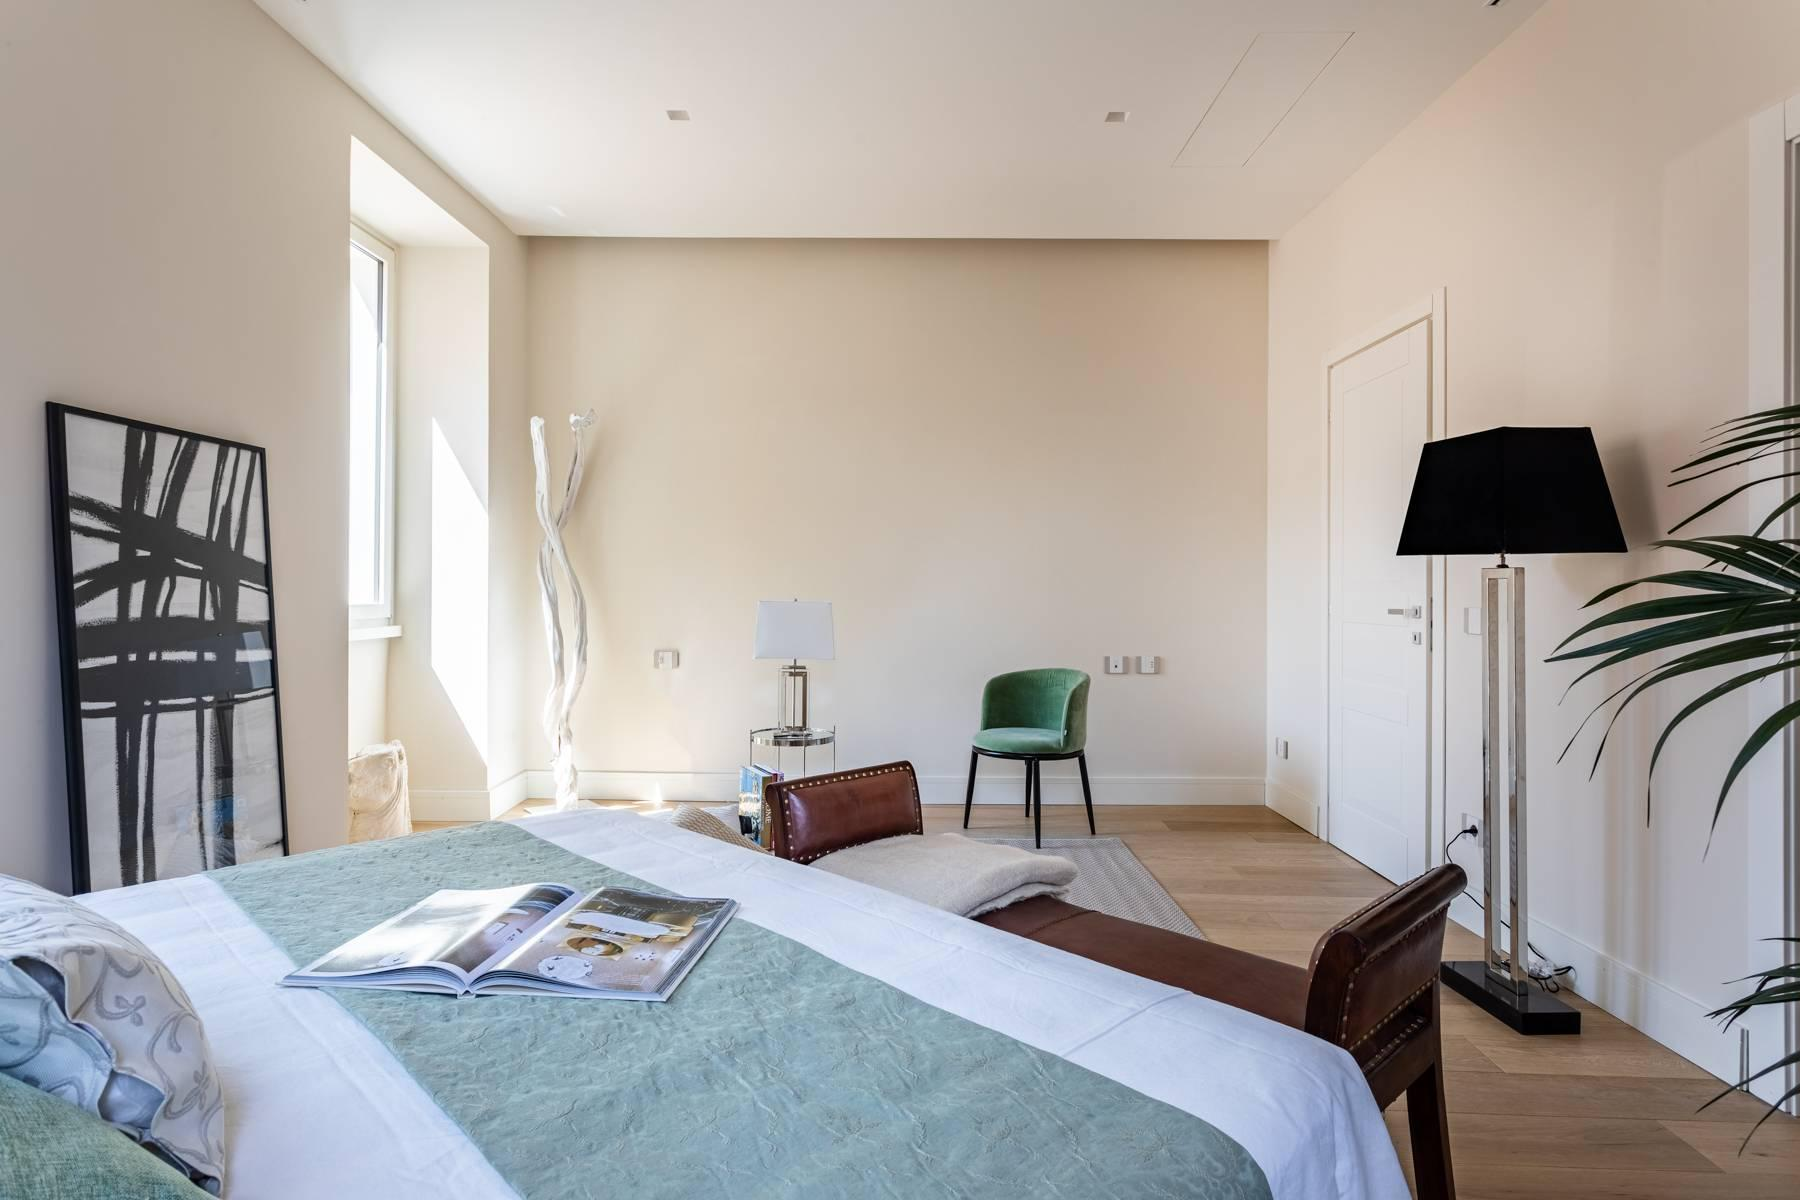 Spanish Steps luxury turnkey apartment - 17